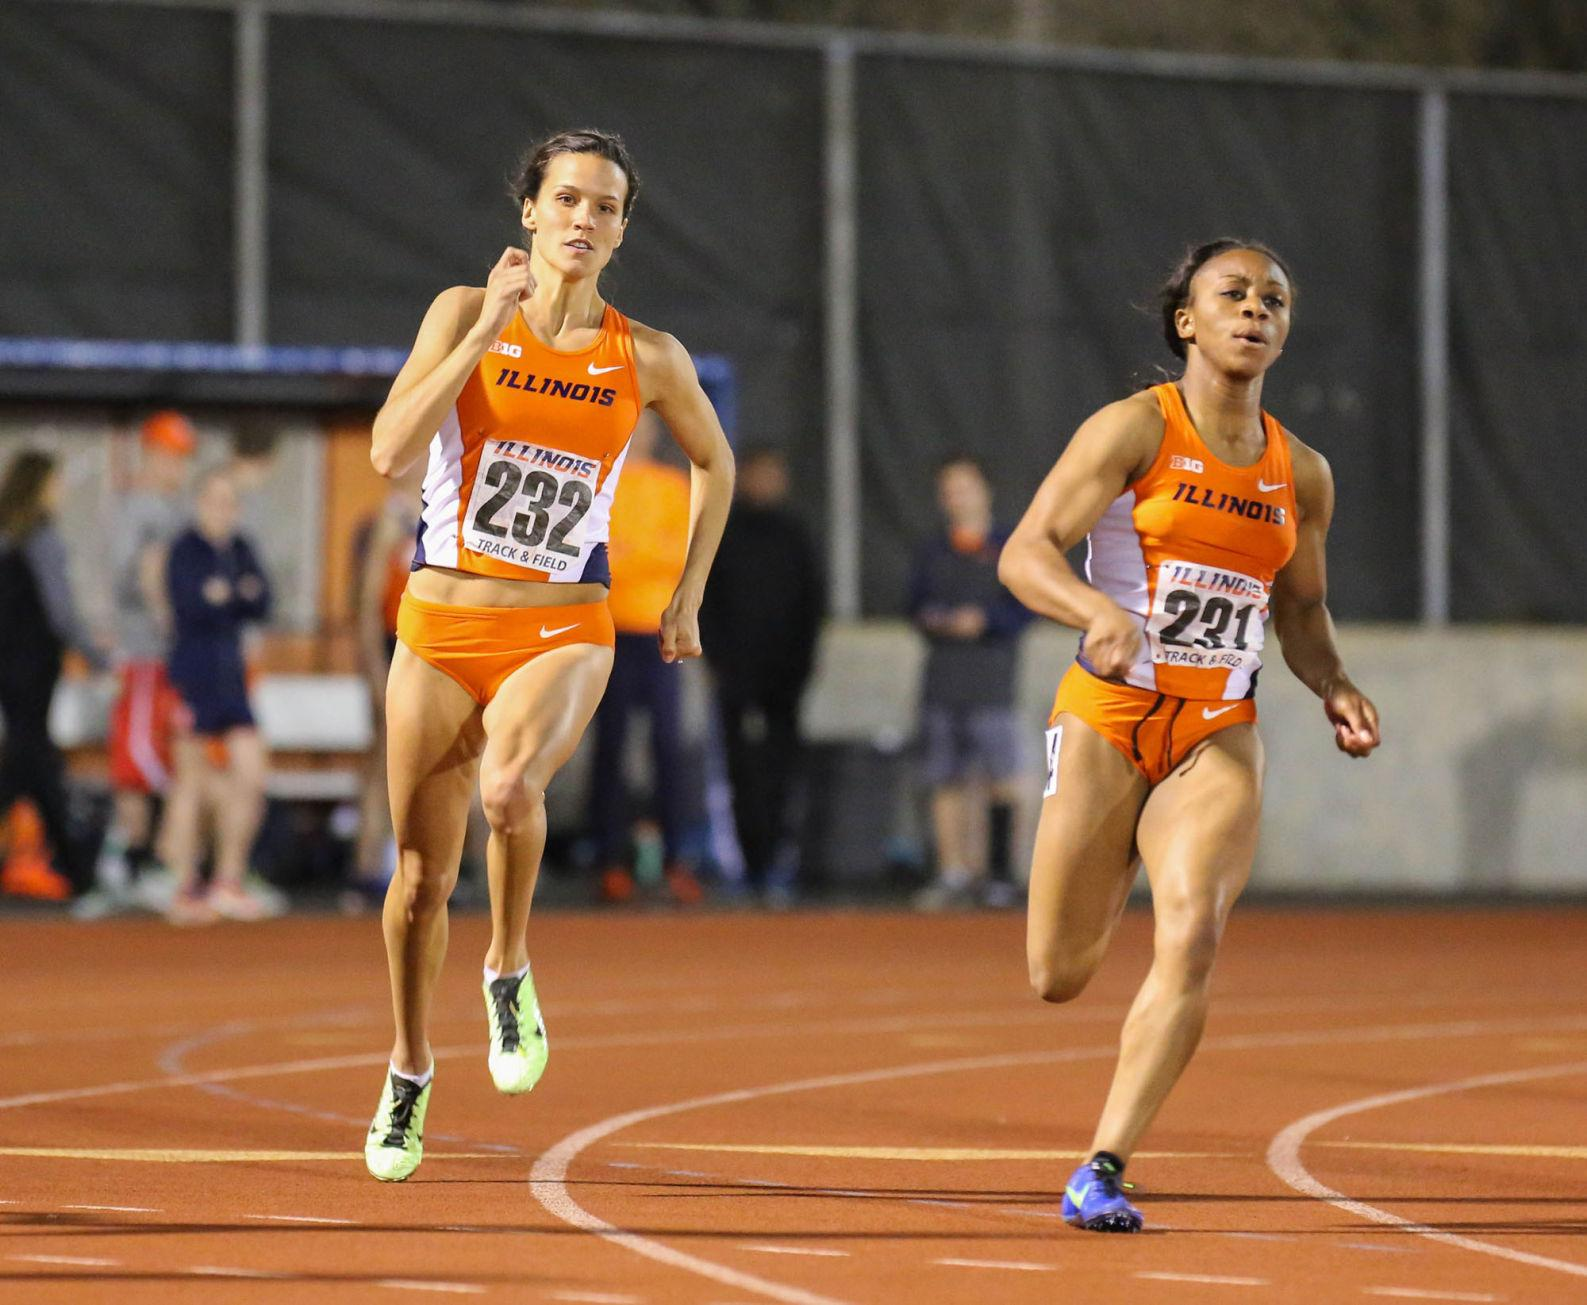 Illinois' Amanda Duvendak (232) runs the 200 meter dash during the Illinois Twilight Invitational at the Track and Soccer Stadium on Saturday, April 18.